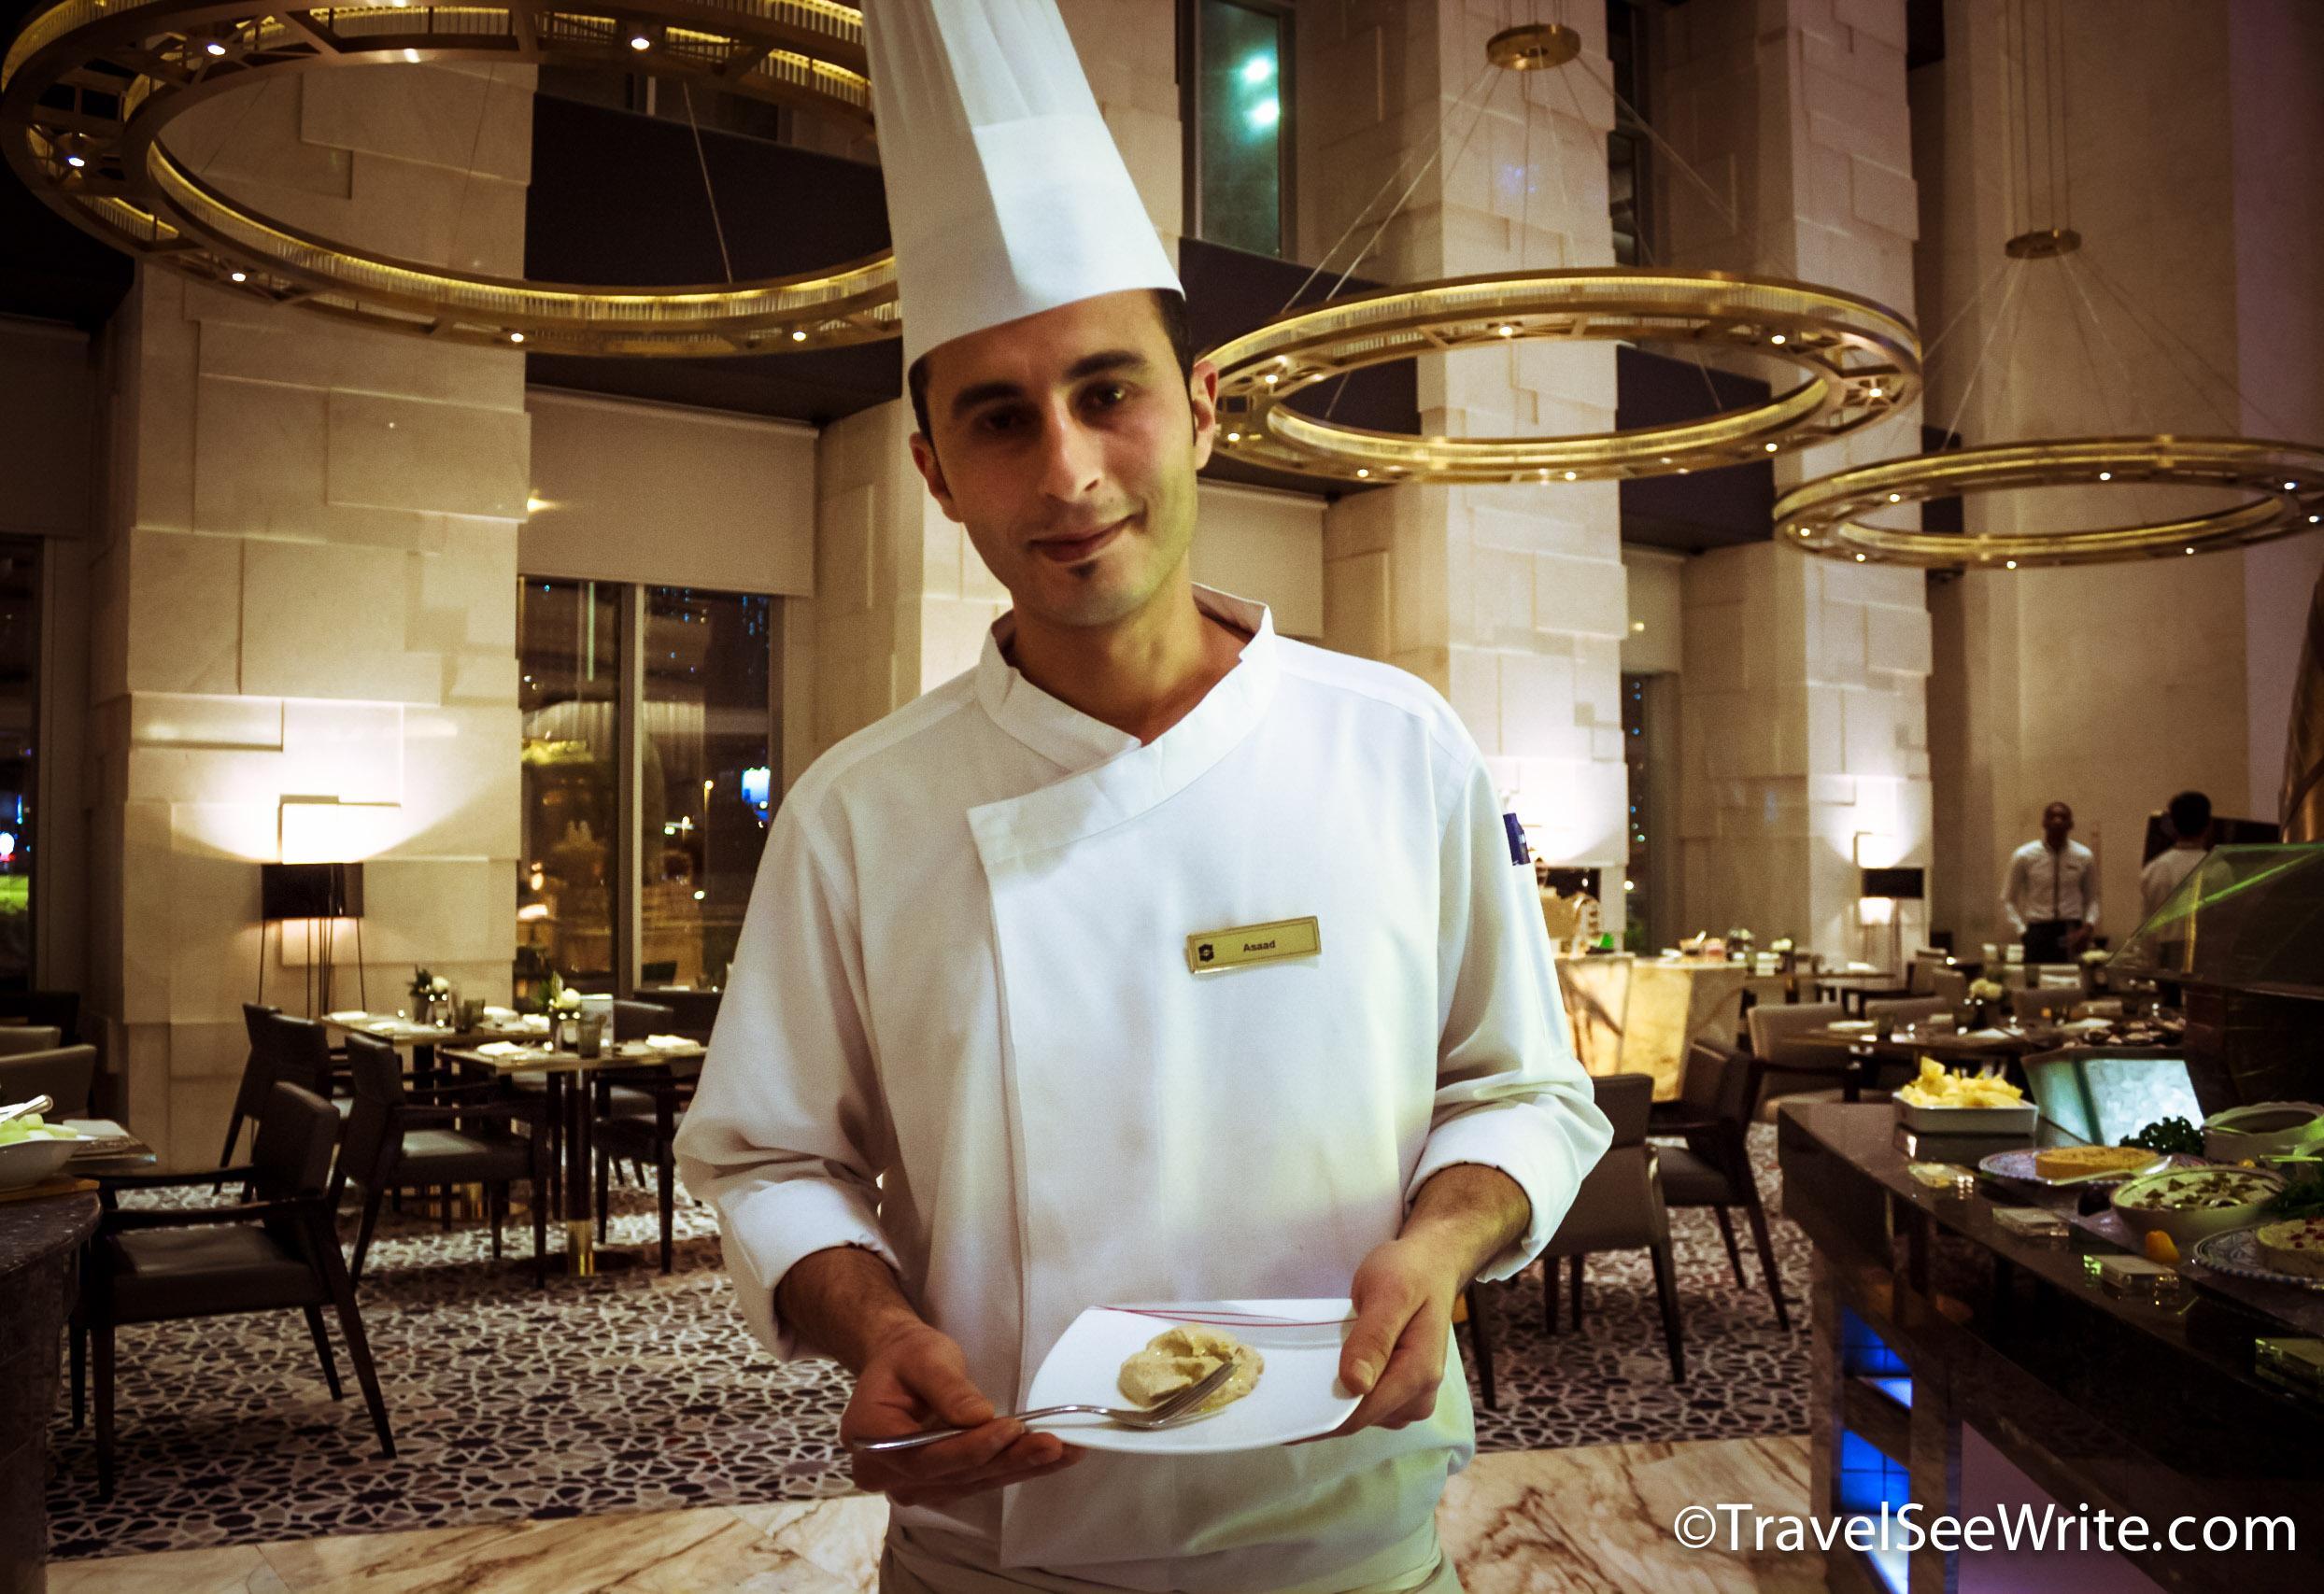 Shangri la the best luxury hotel in dubai travelseewrite for Dubai best hotel name